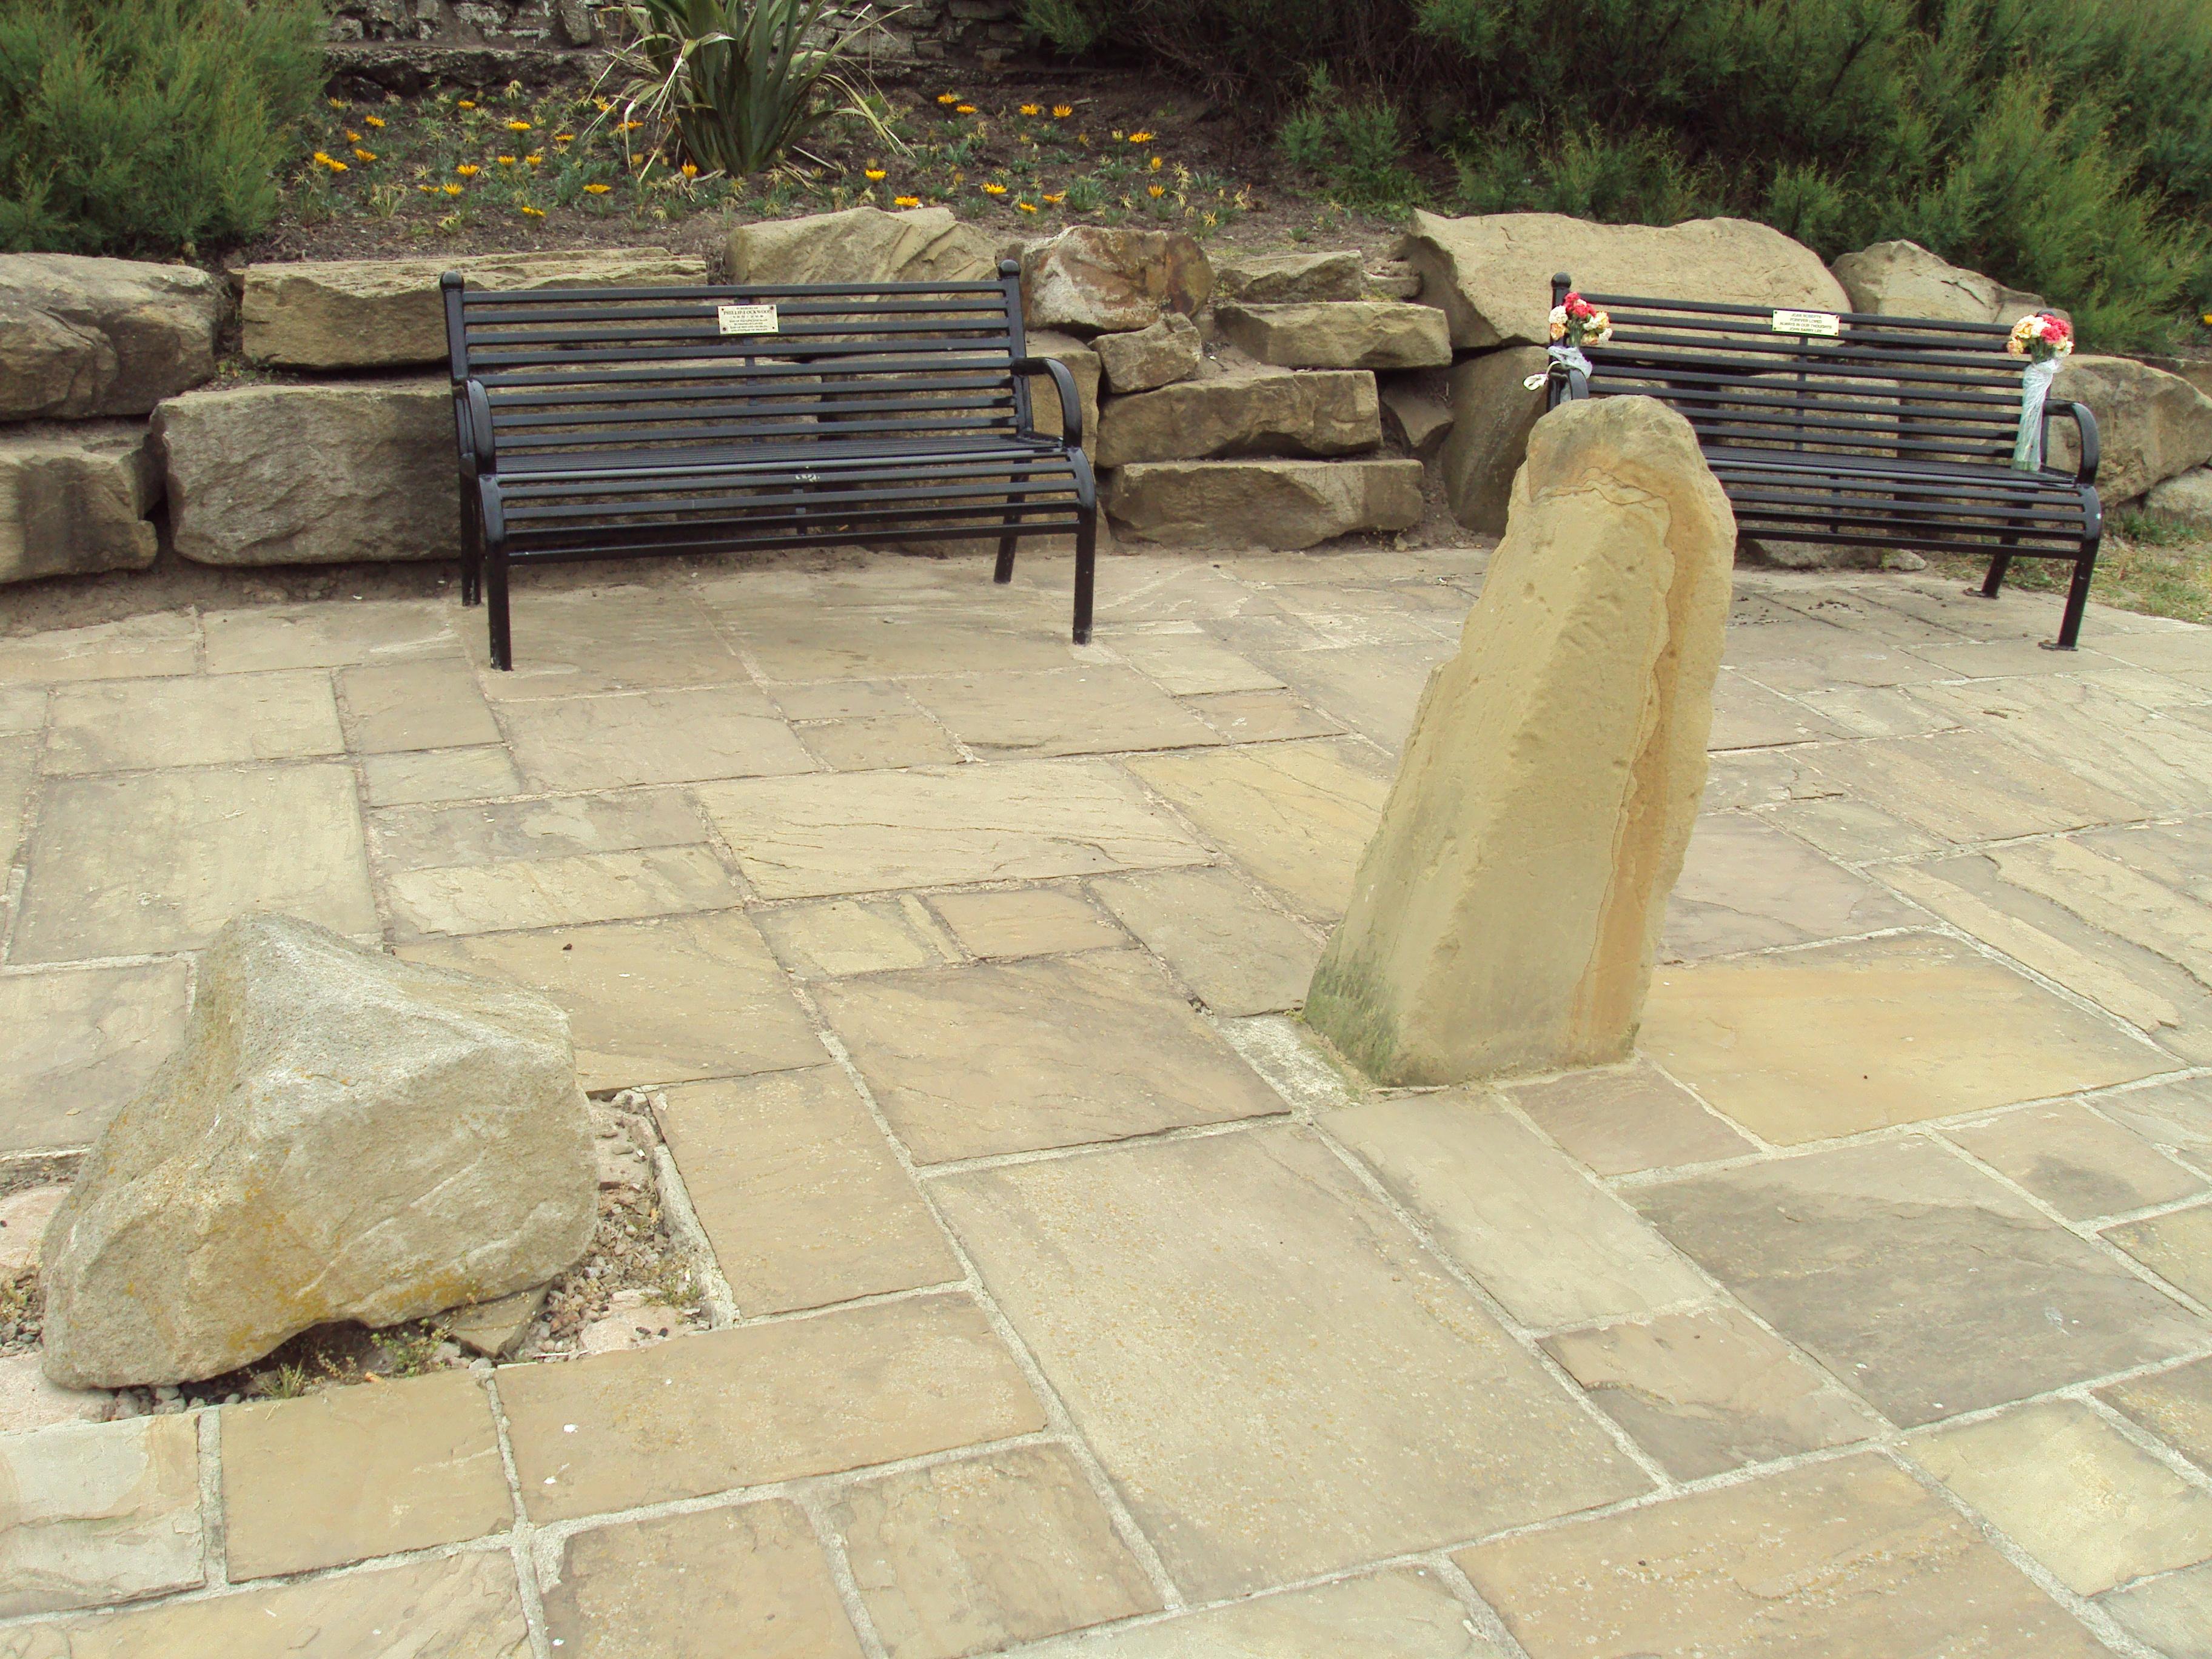 File:Memorial Benches, Jubilee Gardens, Blackpool   DSC06666.JPG